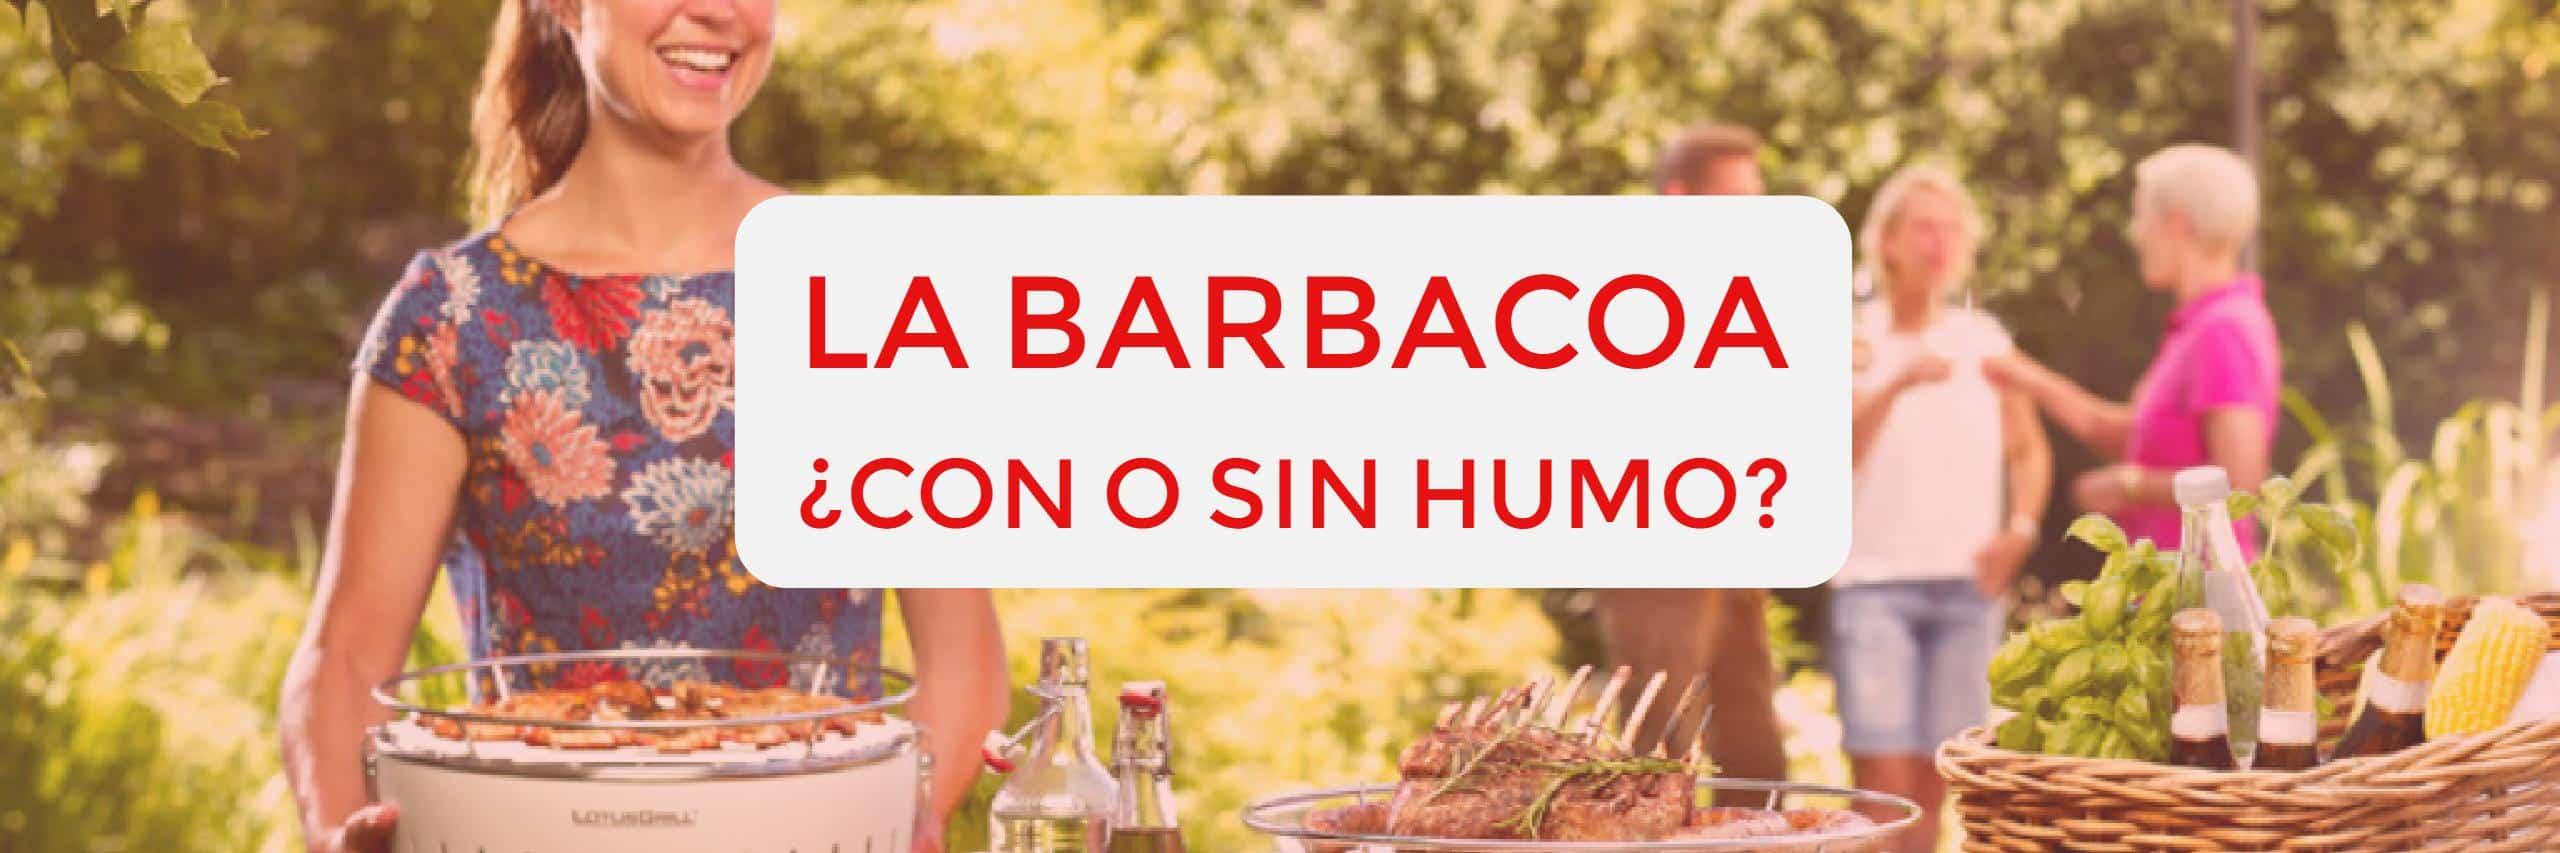 La barbacoa con o sin humo - Barbacoa sin humo ...